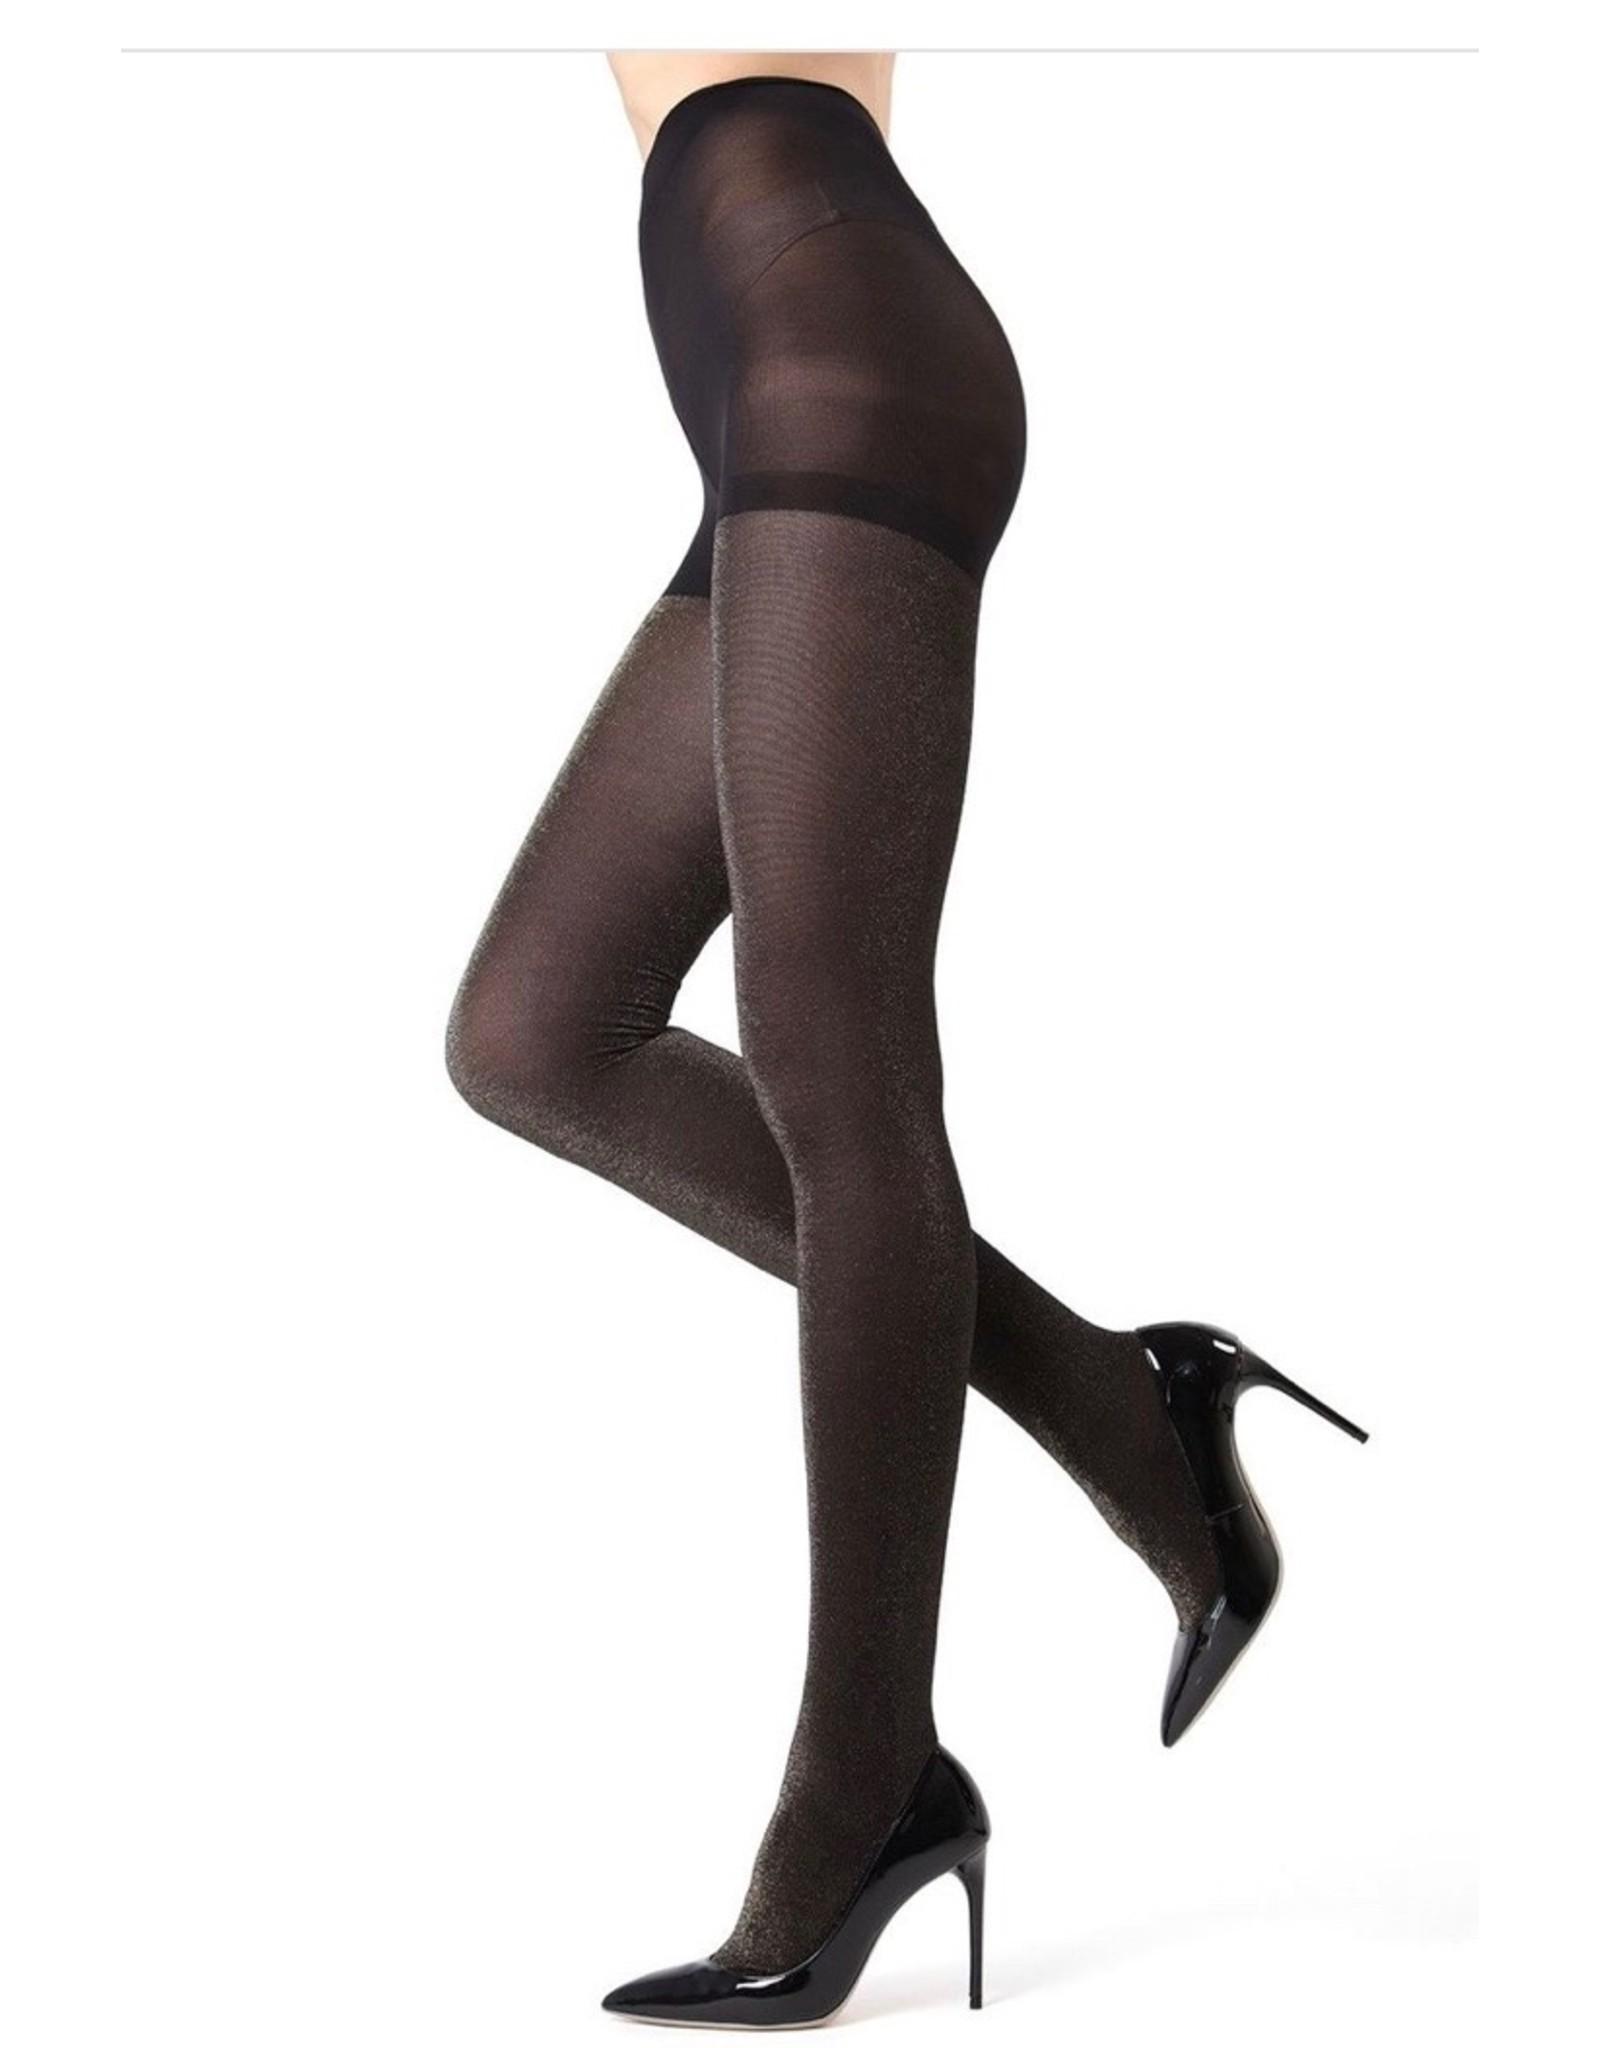 Memoi Memoi Women's Glitter Opaque Fashion Tight MO-357